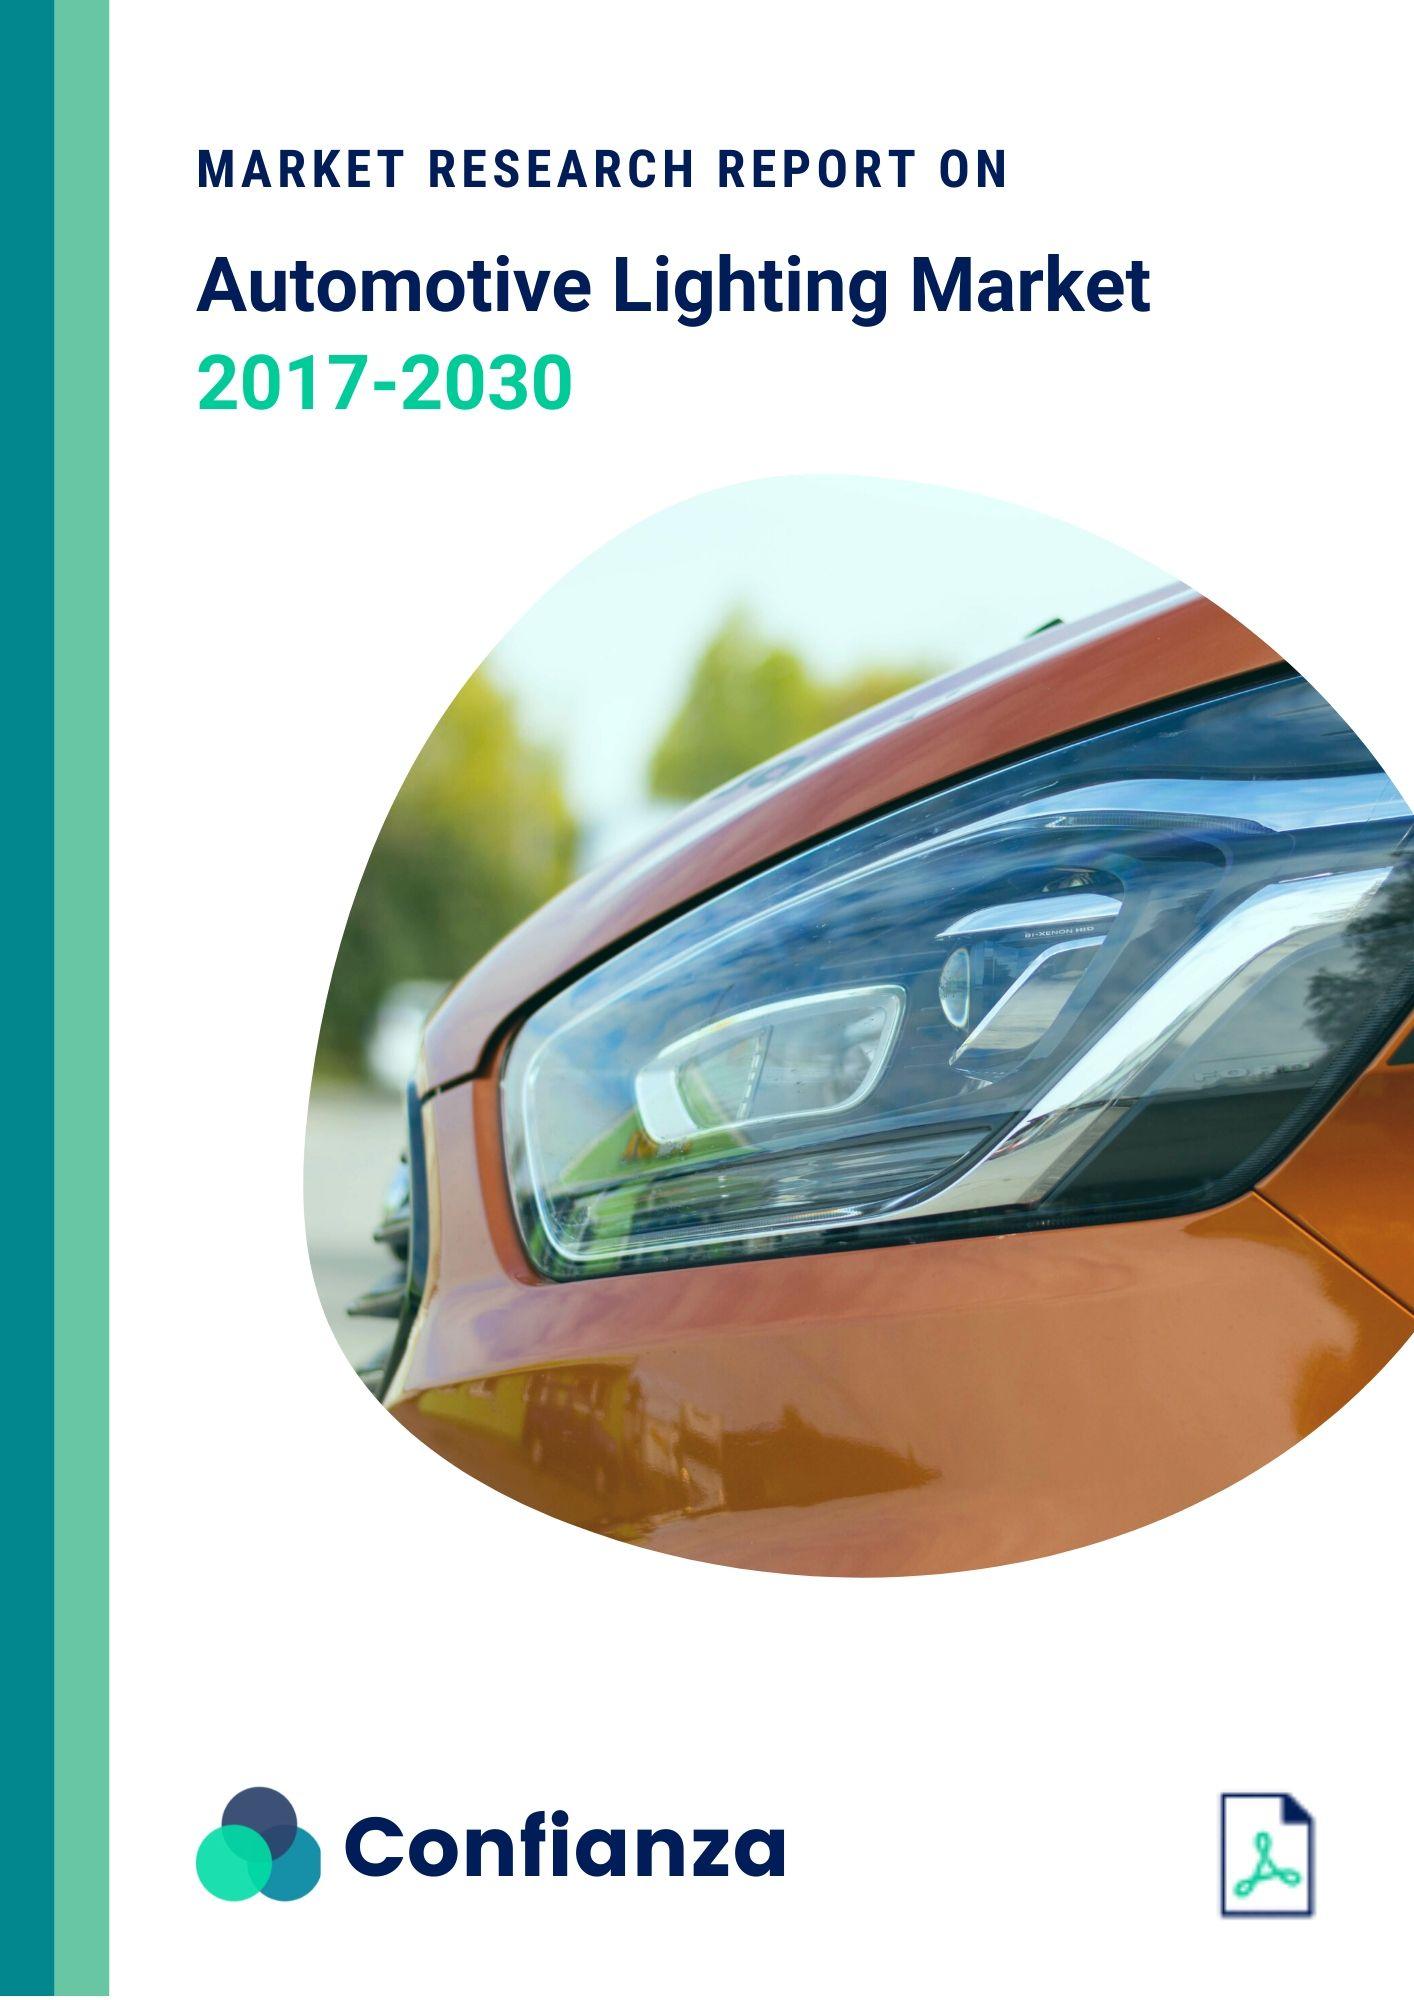 Global Automotive Lighting Market to Reach USD USD 48.11 Billion Market Size By 2030